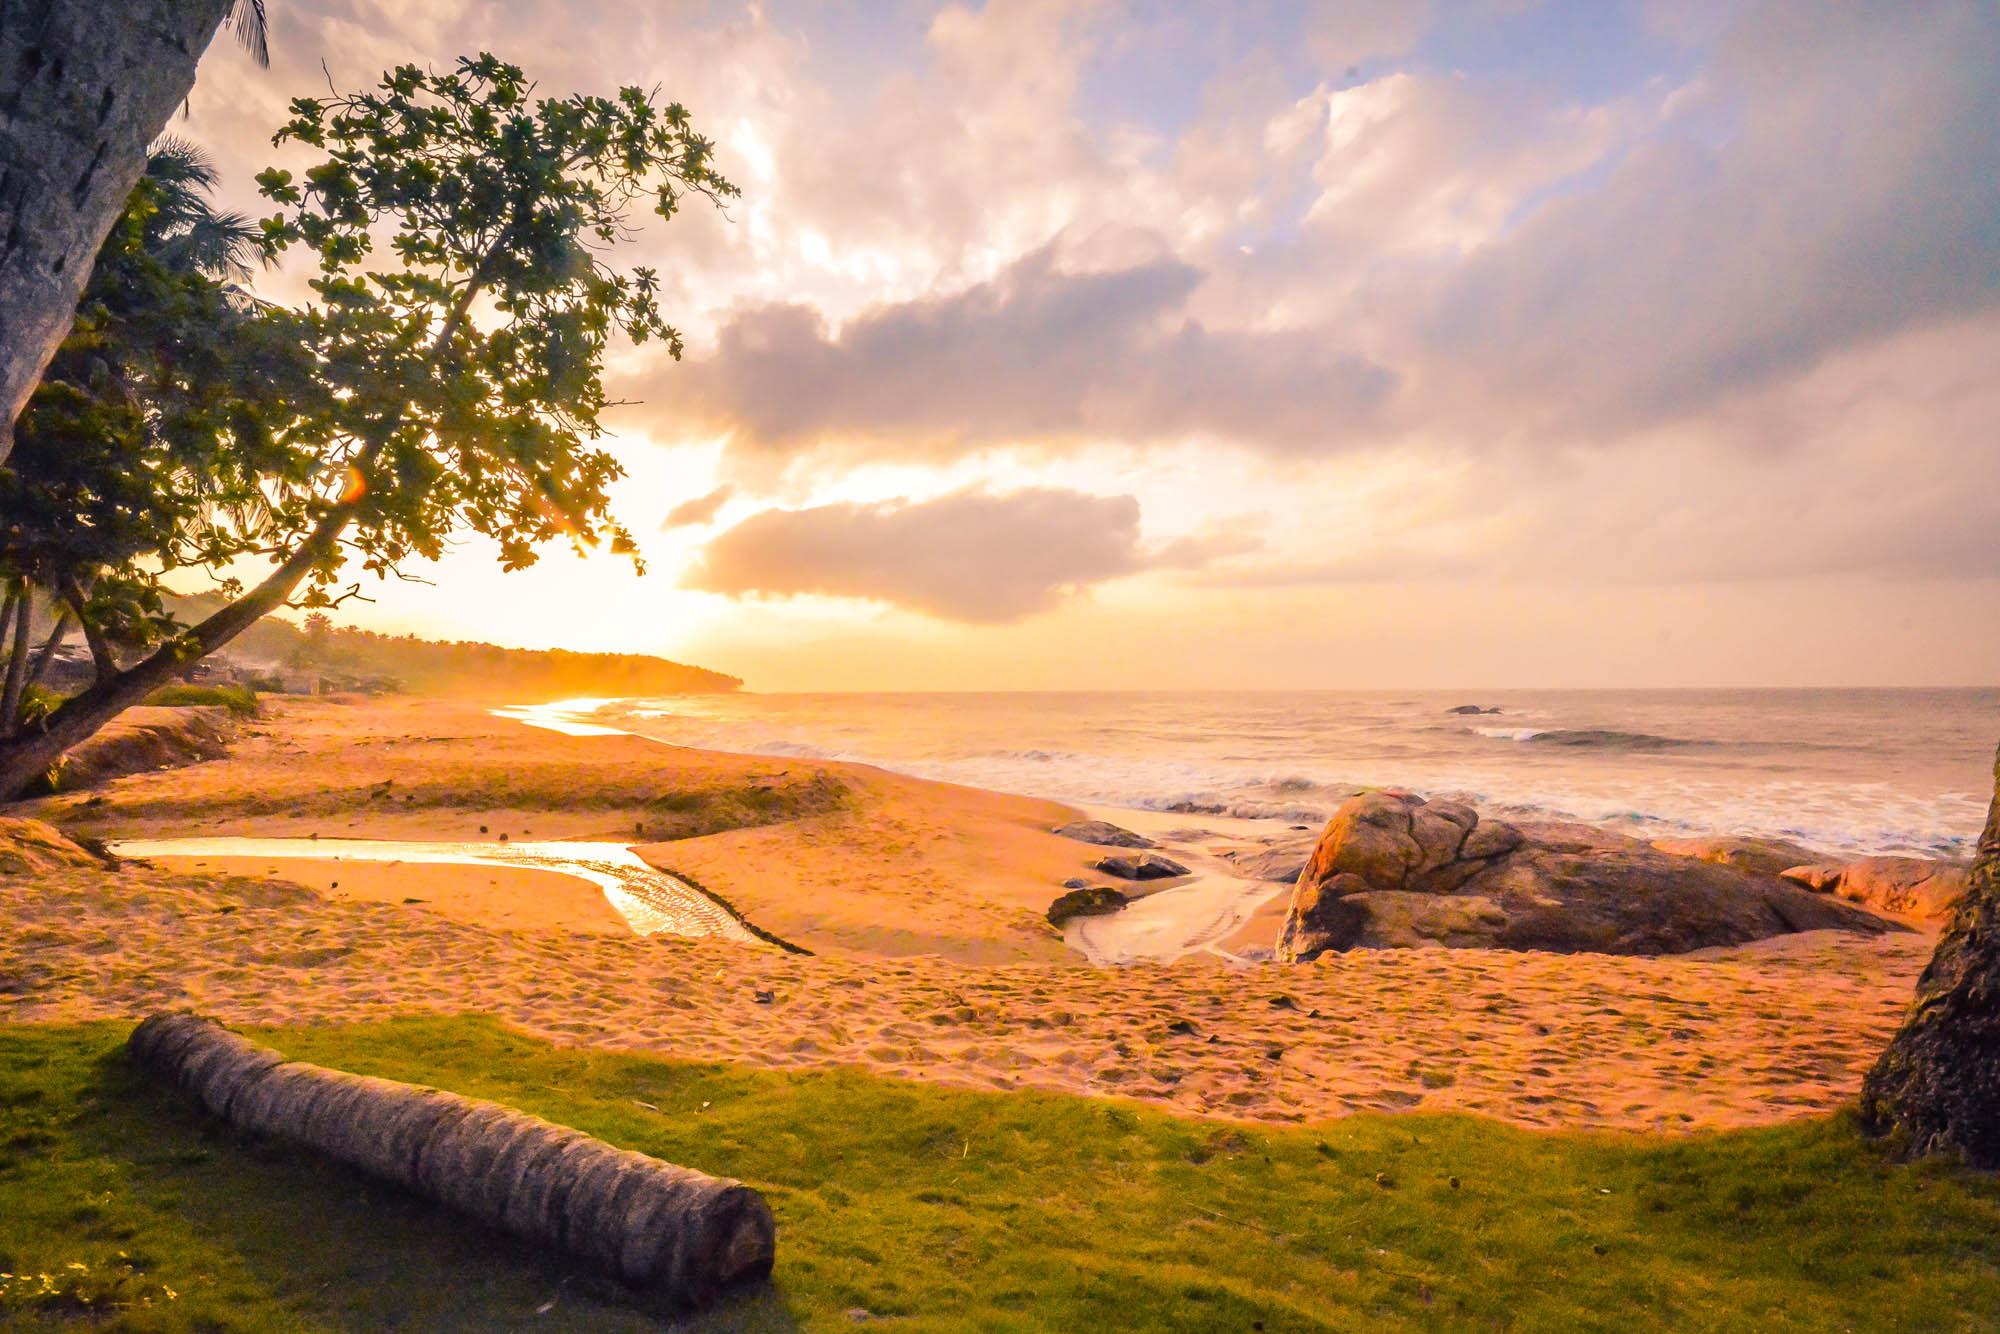 Jiru Offreiku - Sonnenaufgang